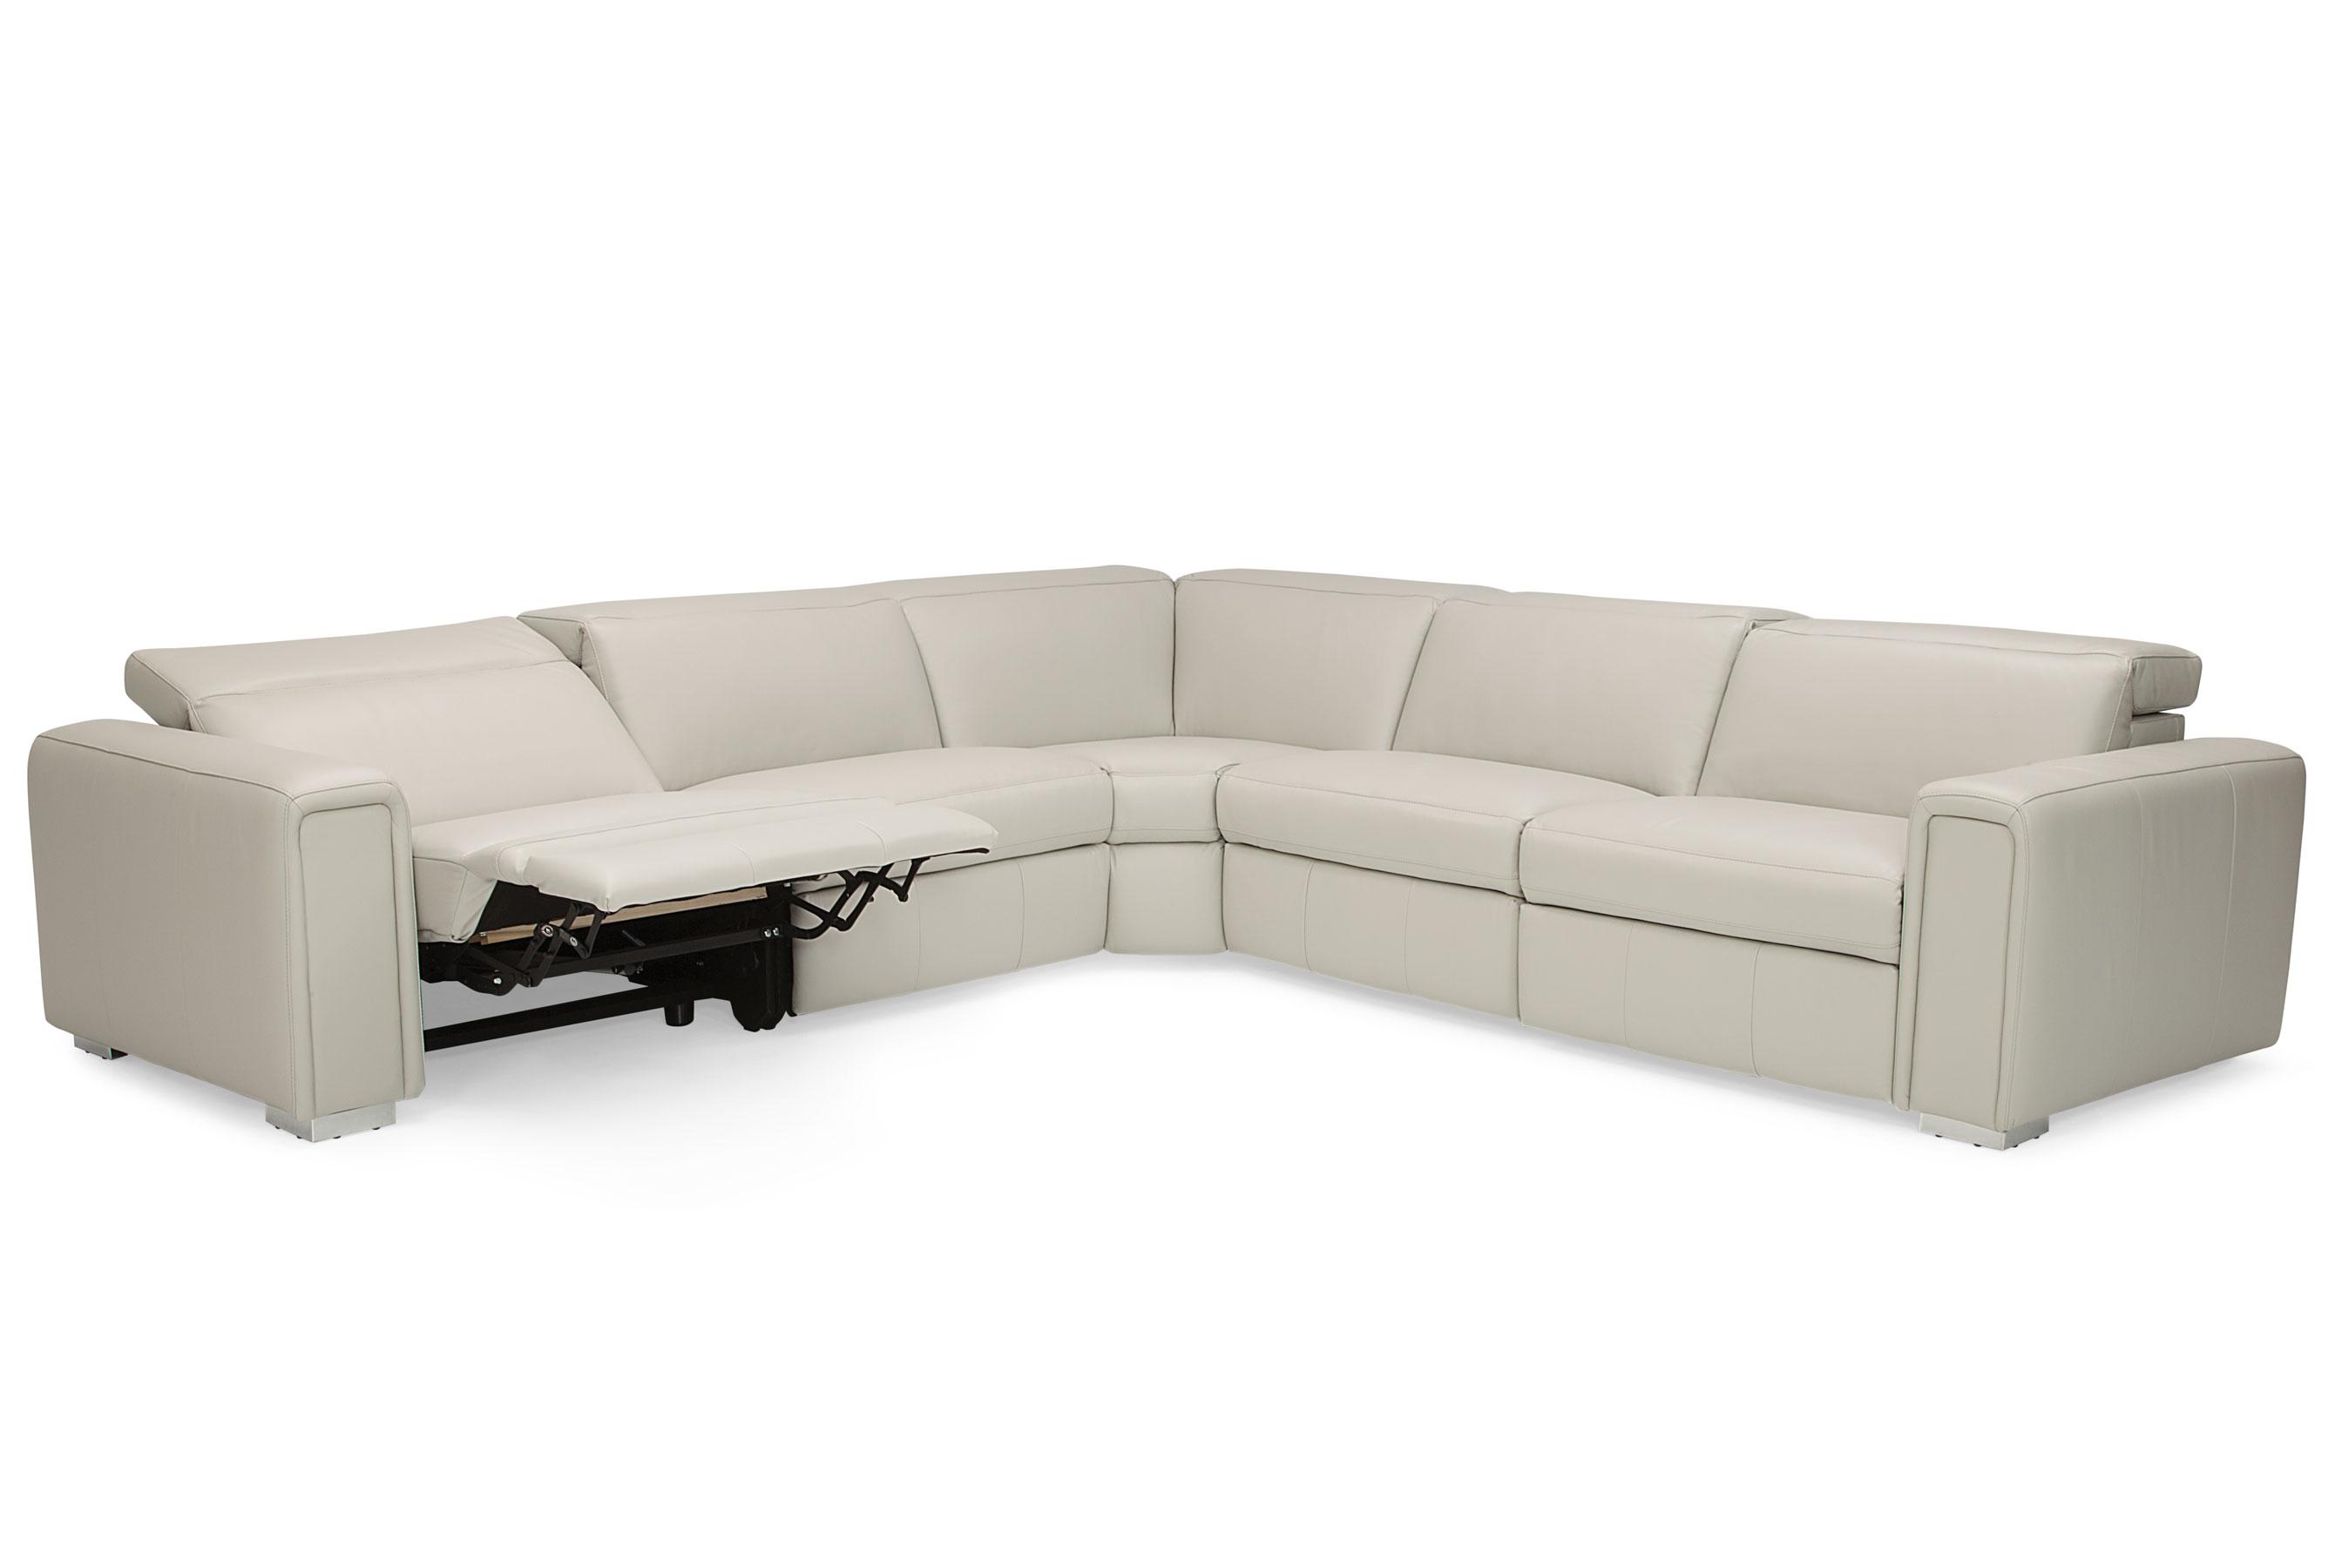 Stupendous Titan 44004 Power Recline Power Headrest Sofas And Sectionals Beatyapartments Chair Design Images Beatyapartmentscom